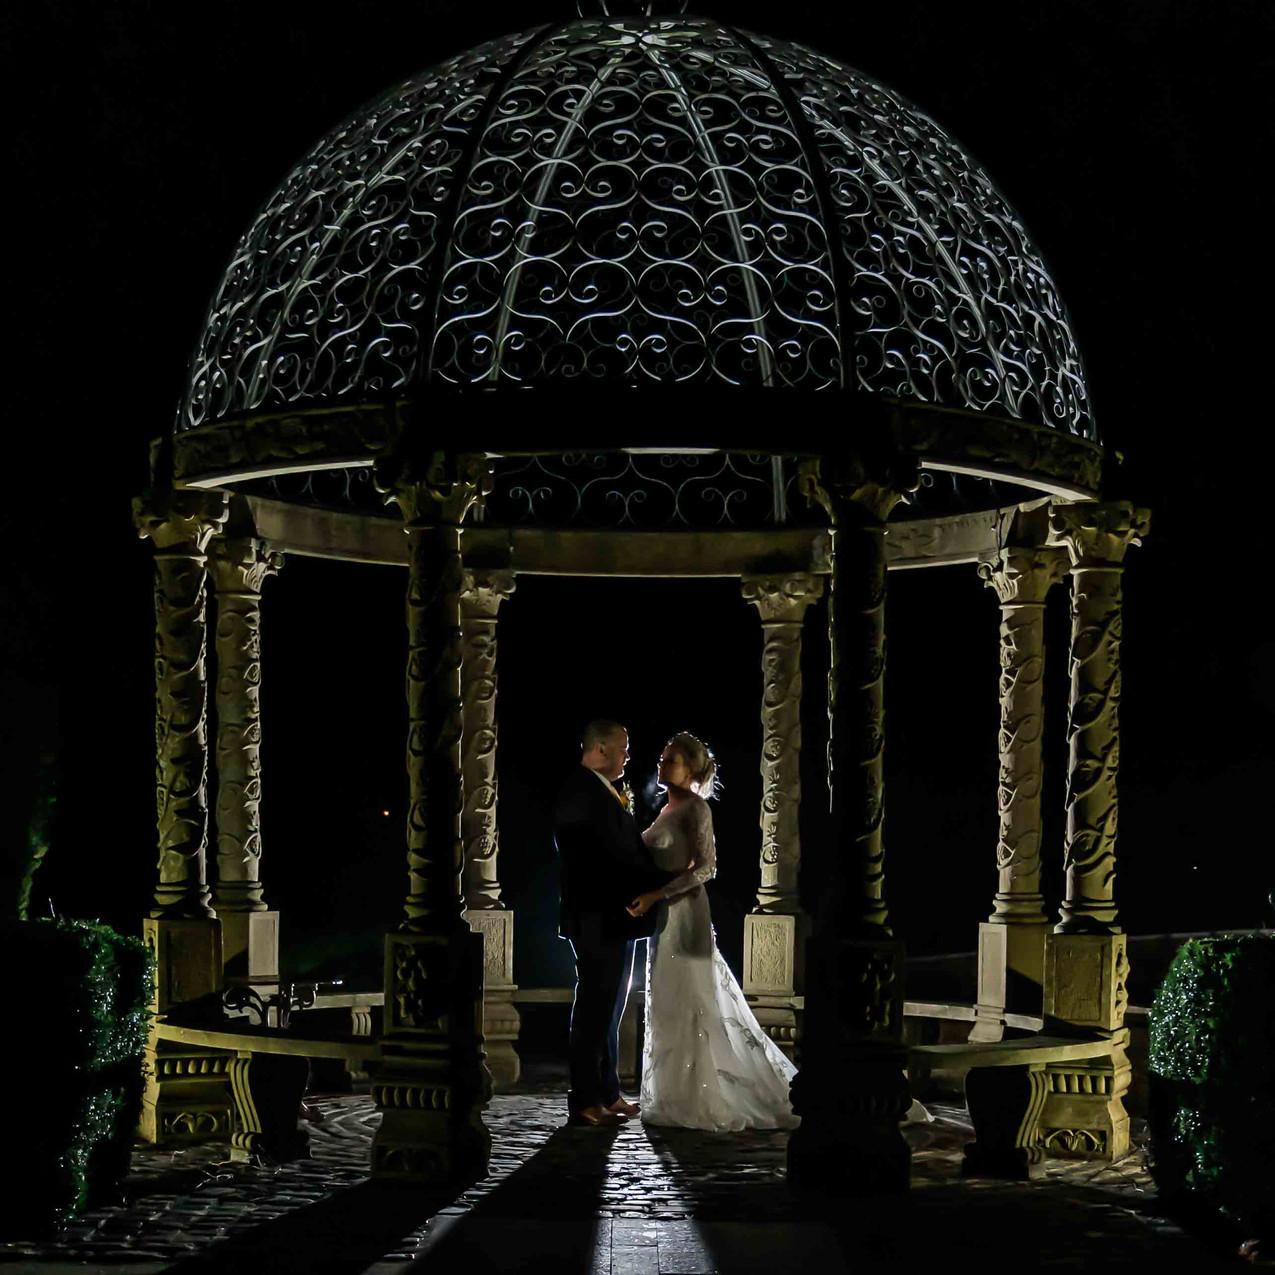 Night wedding portrait